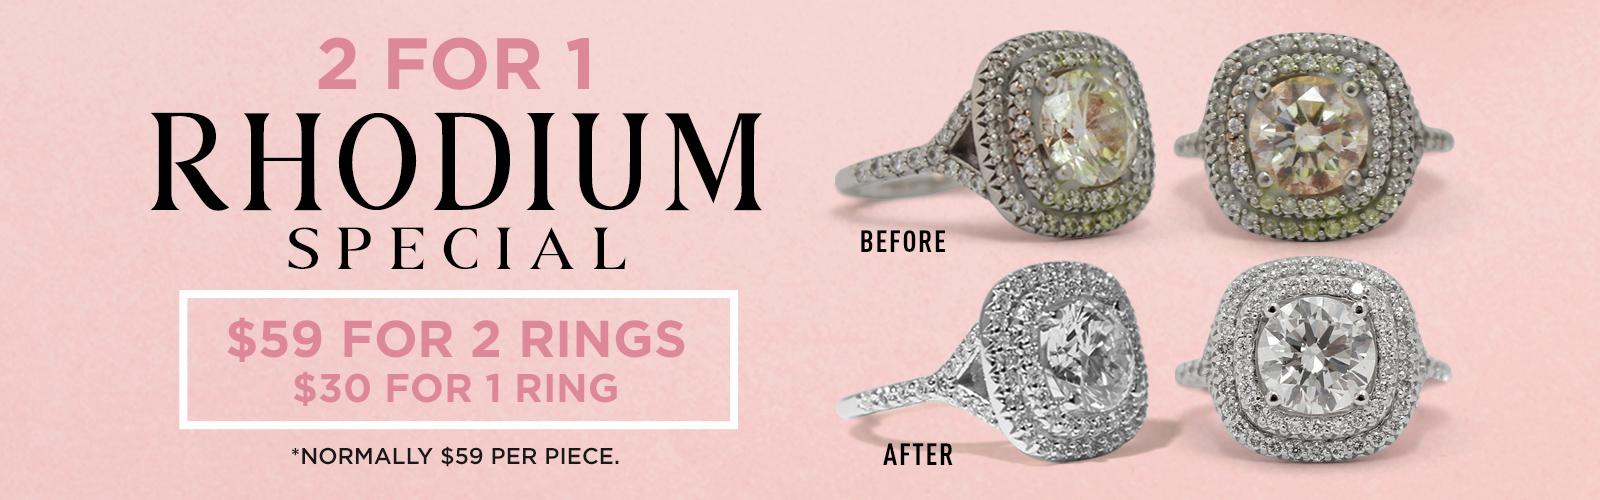 Bentley Diamond - 2 for 1 Rhodium Special